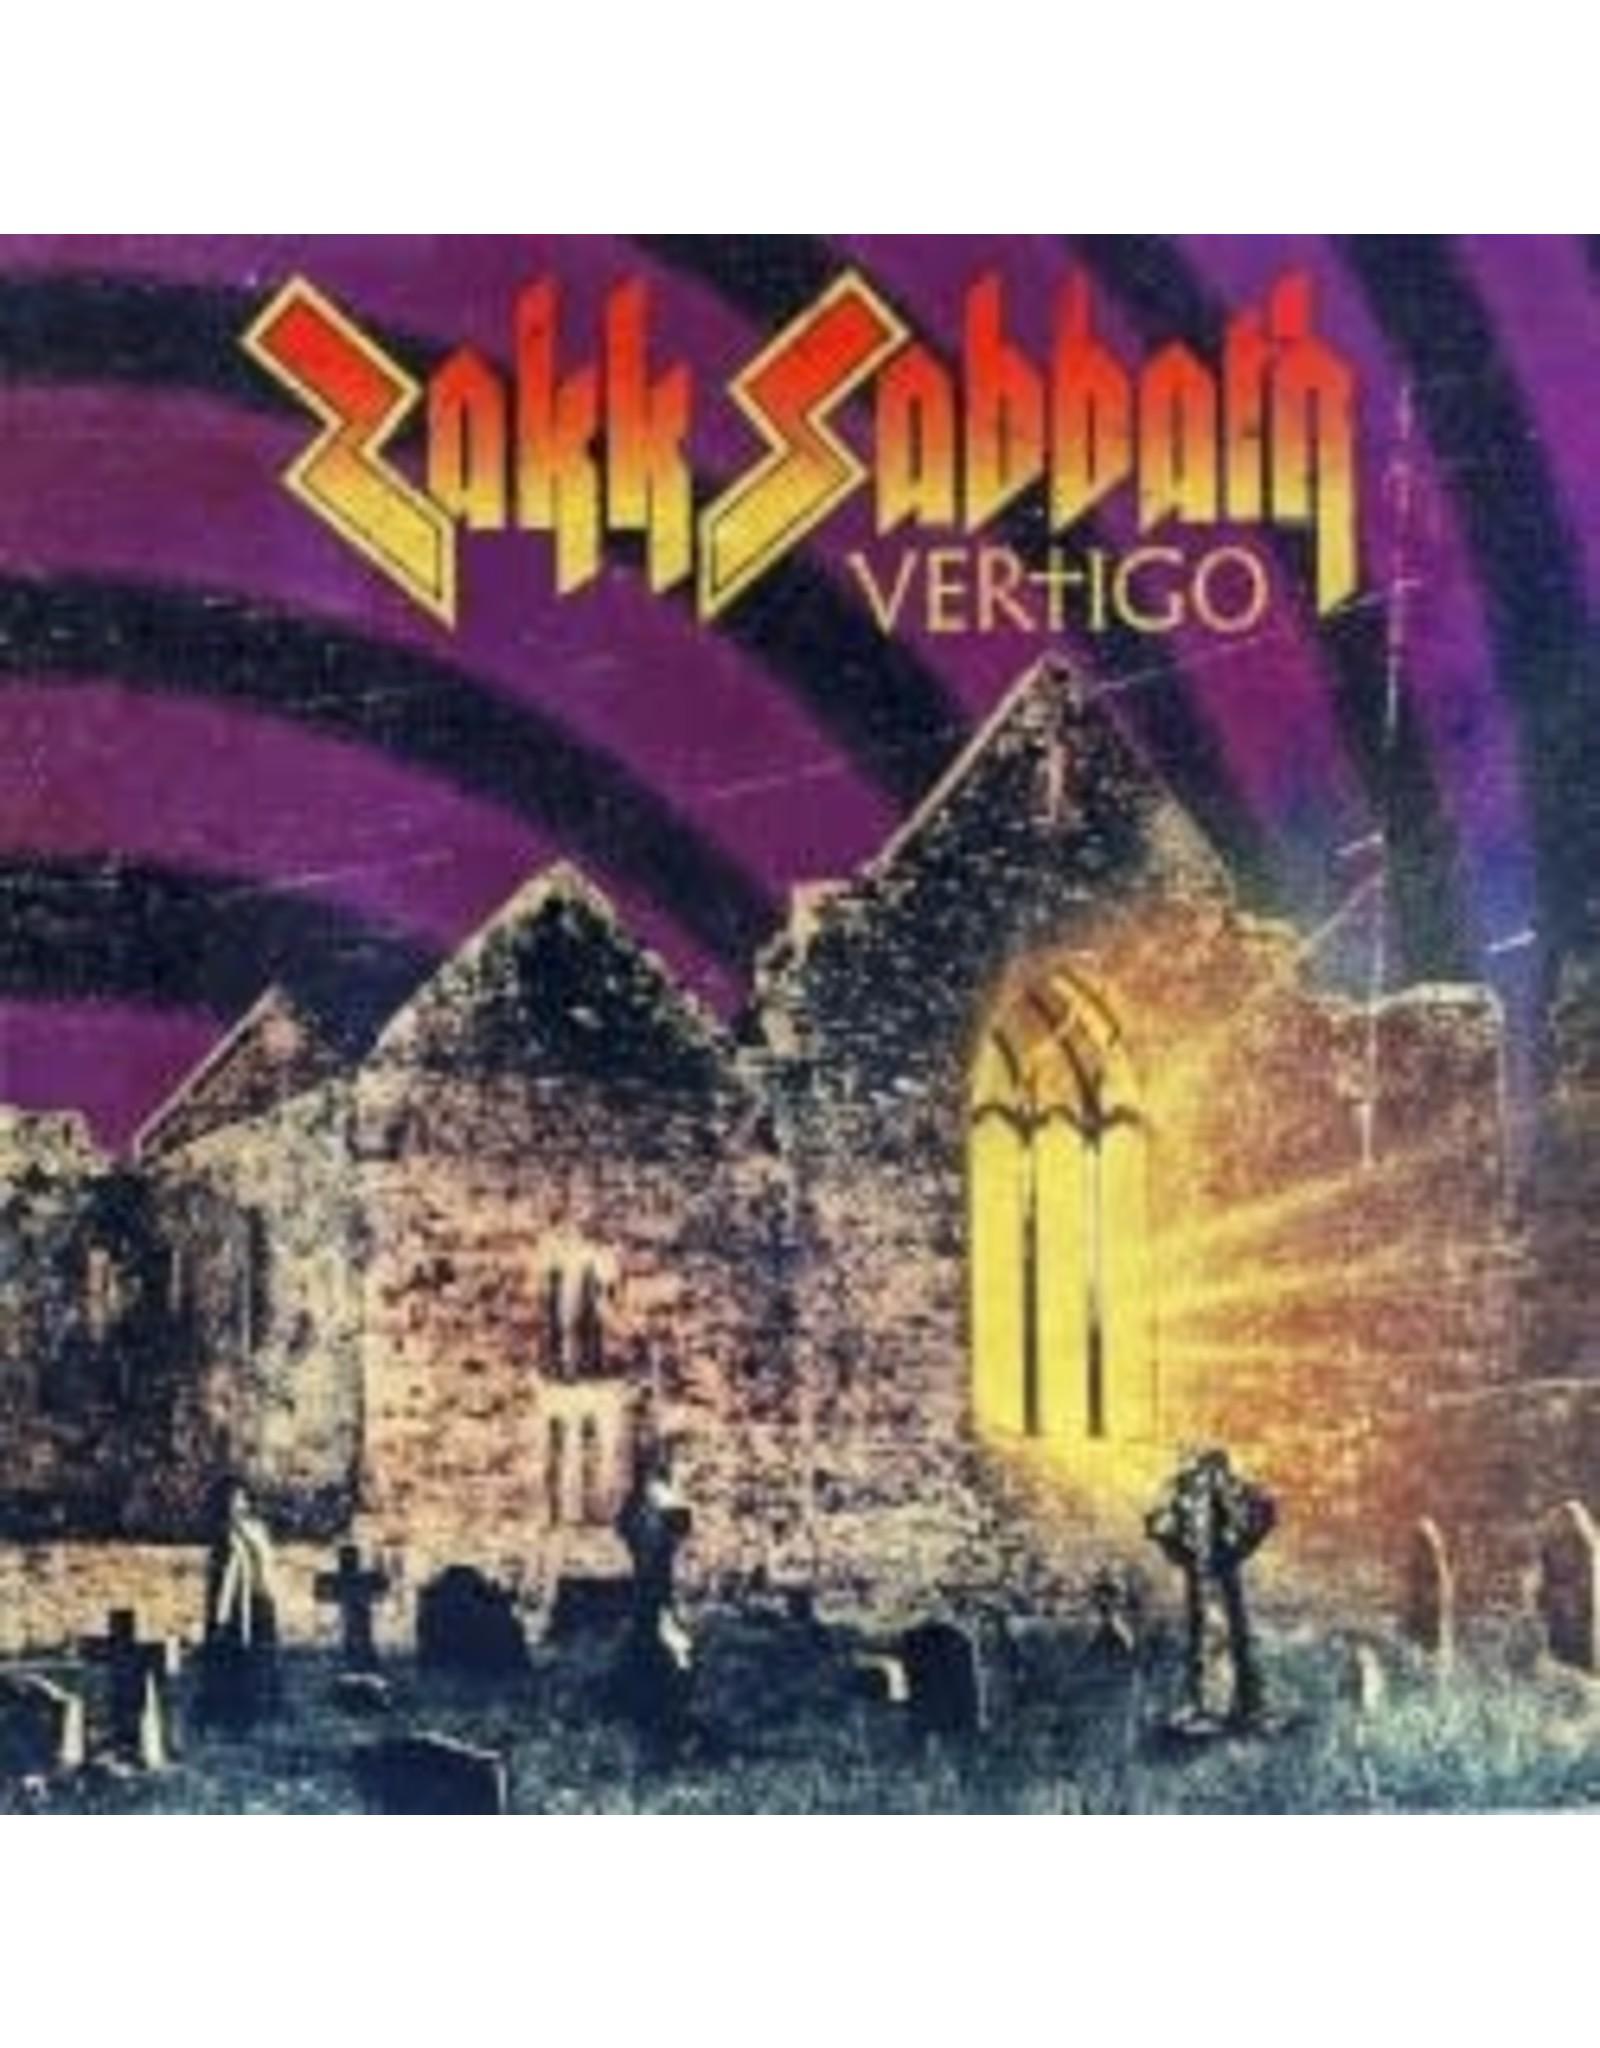 Zakk Sabbath - Vertigo LP